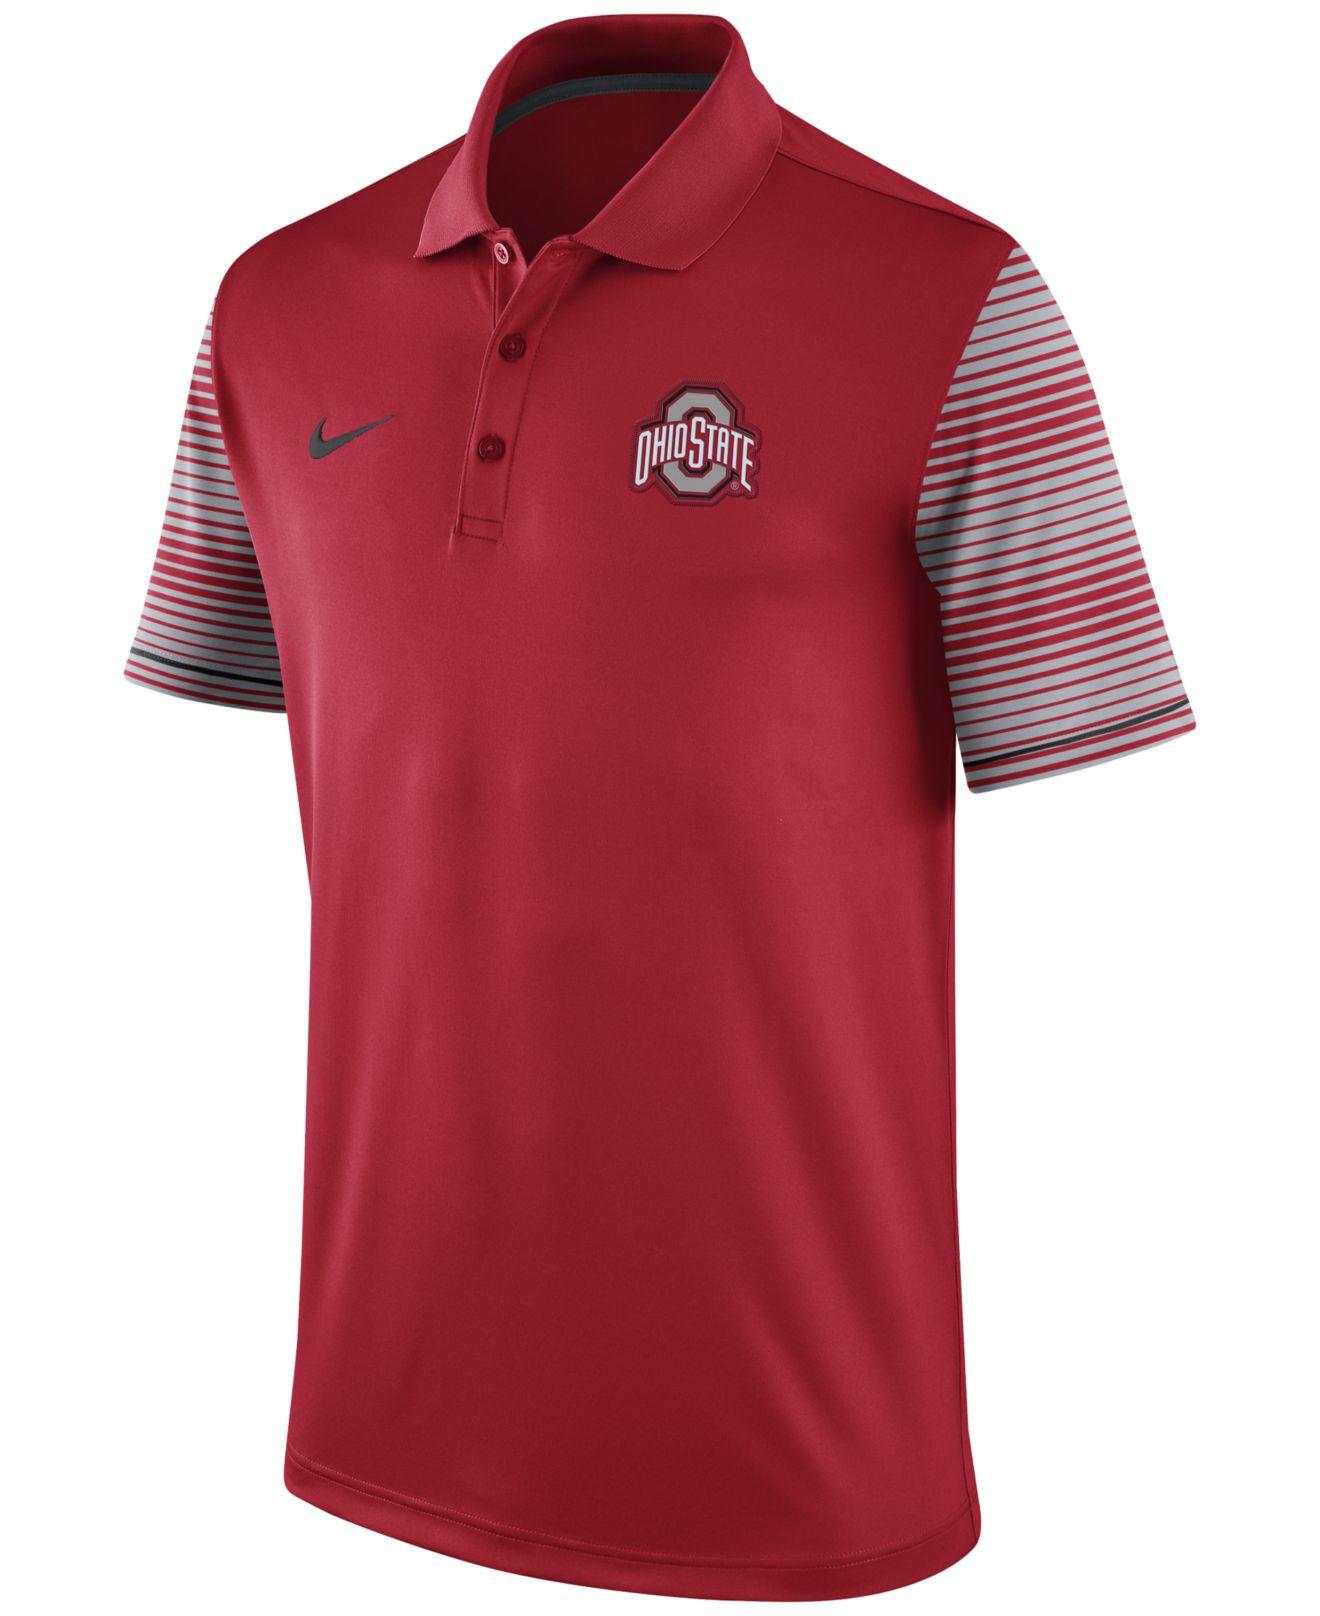 Ohio state nike polo shirts lera sweater for Ohio state polo shirt 3xl